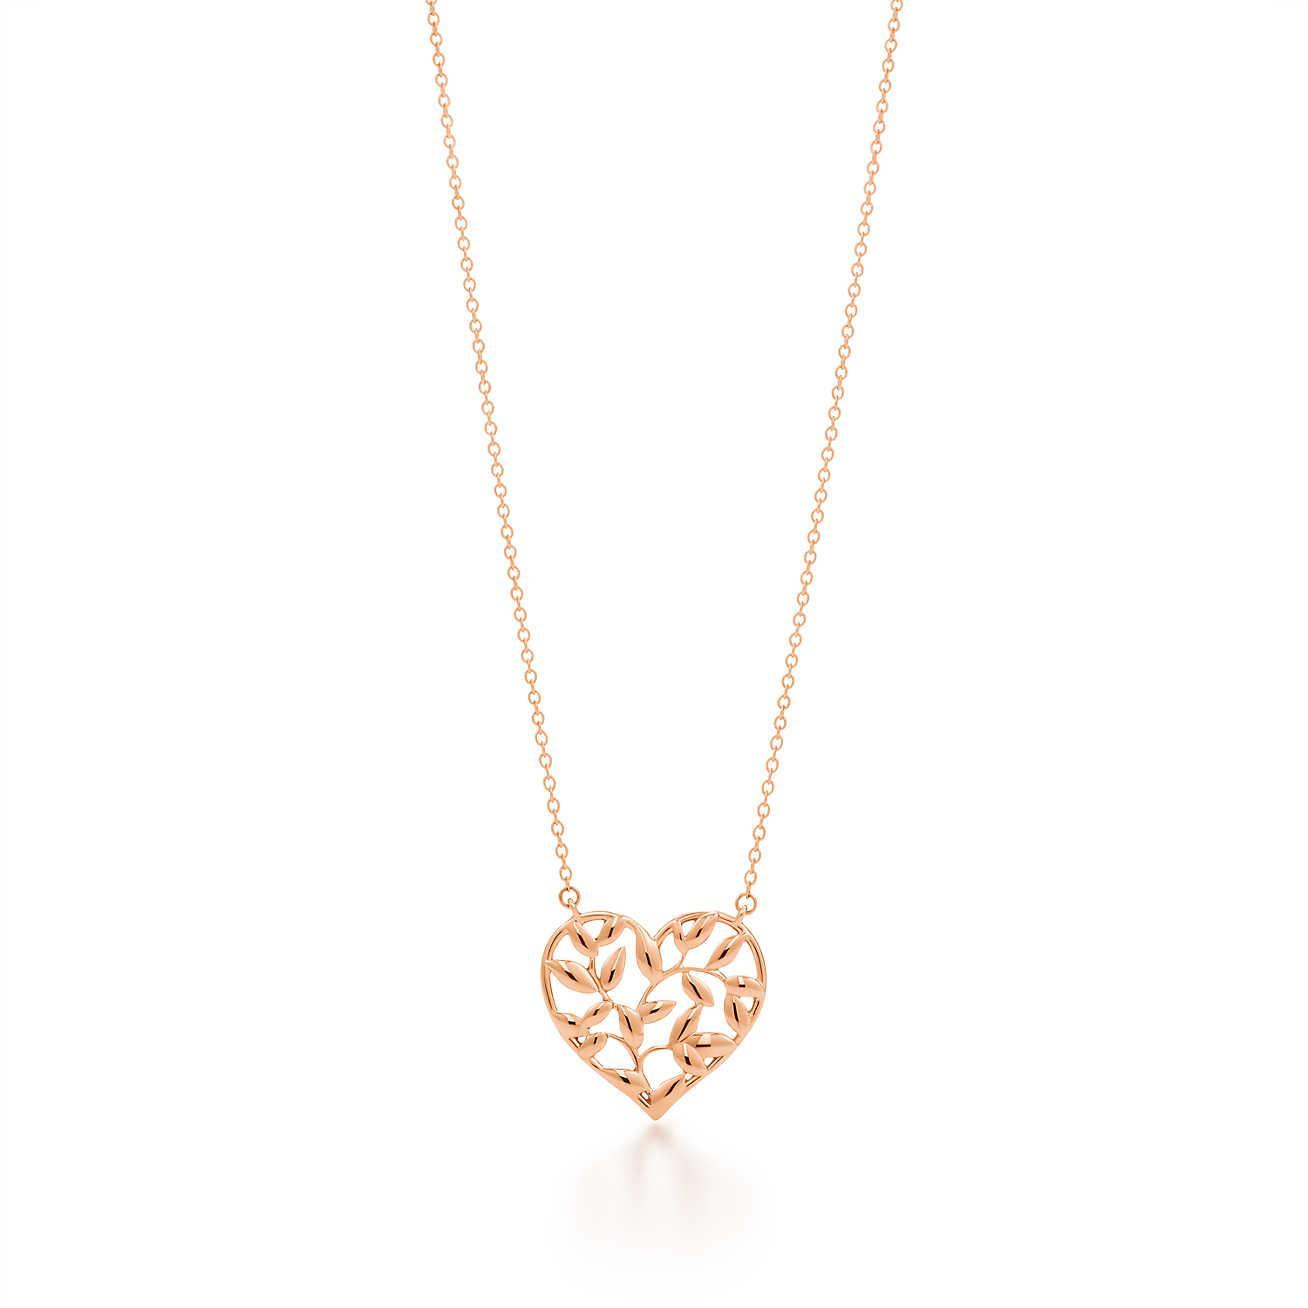 83e120124 Tiffany & Co. Paloma Picasso. Olive Leaf Heart Pendant In 18k Rose ...